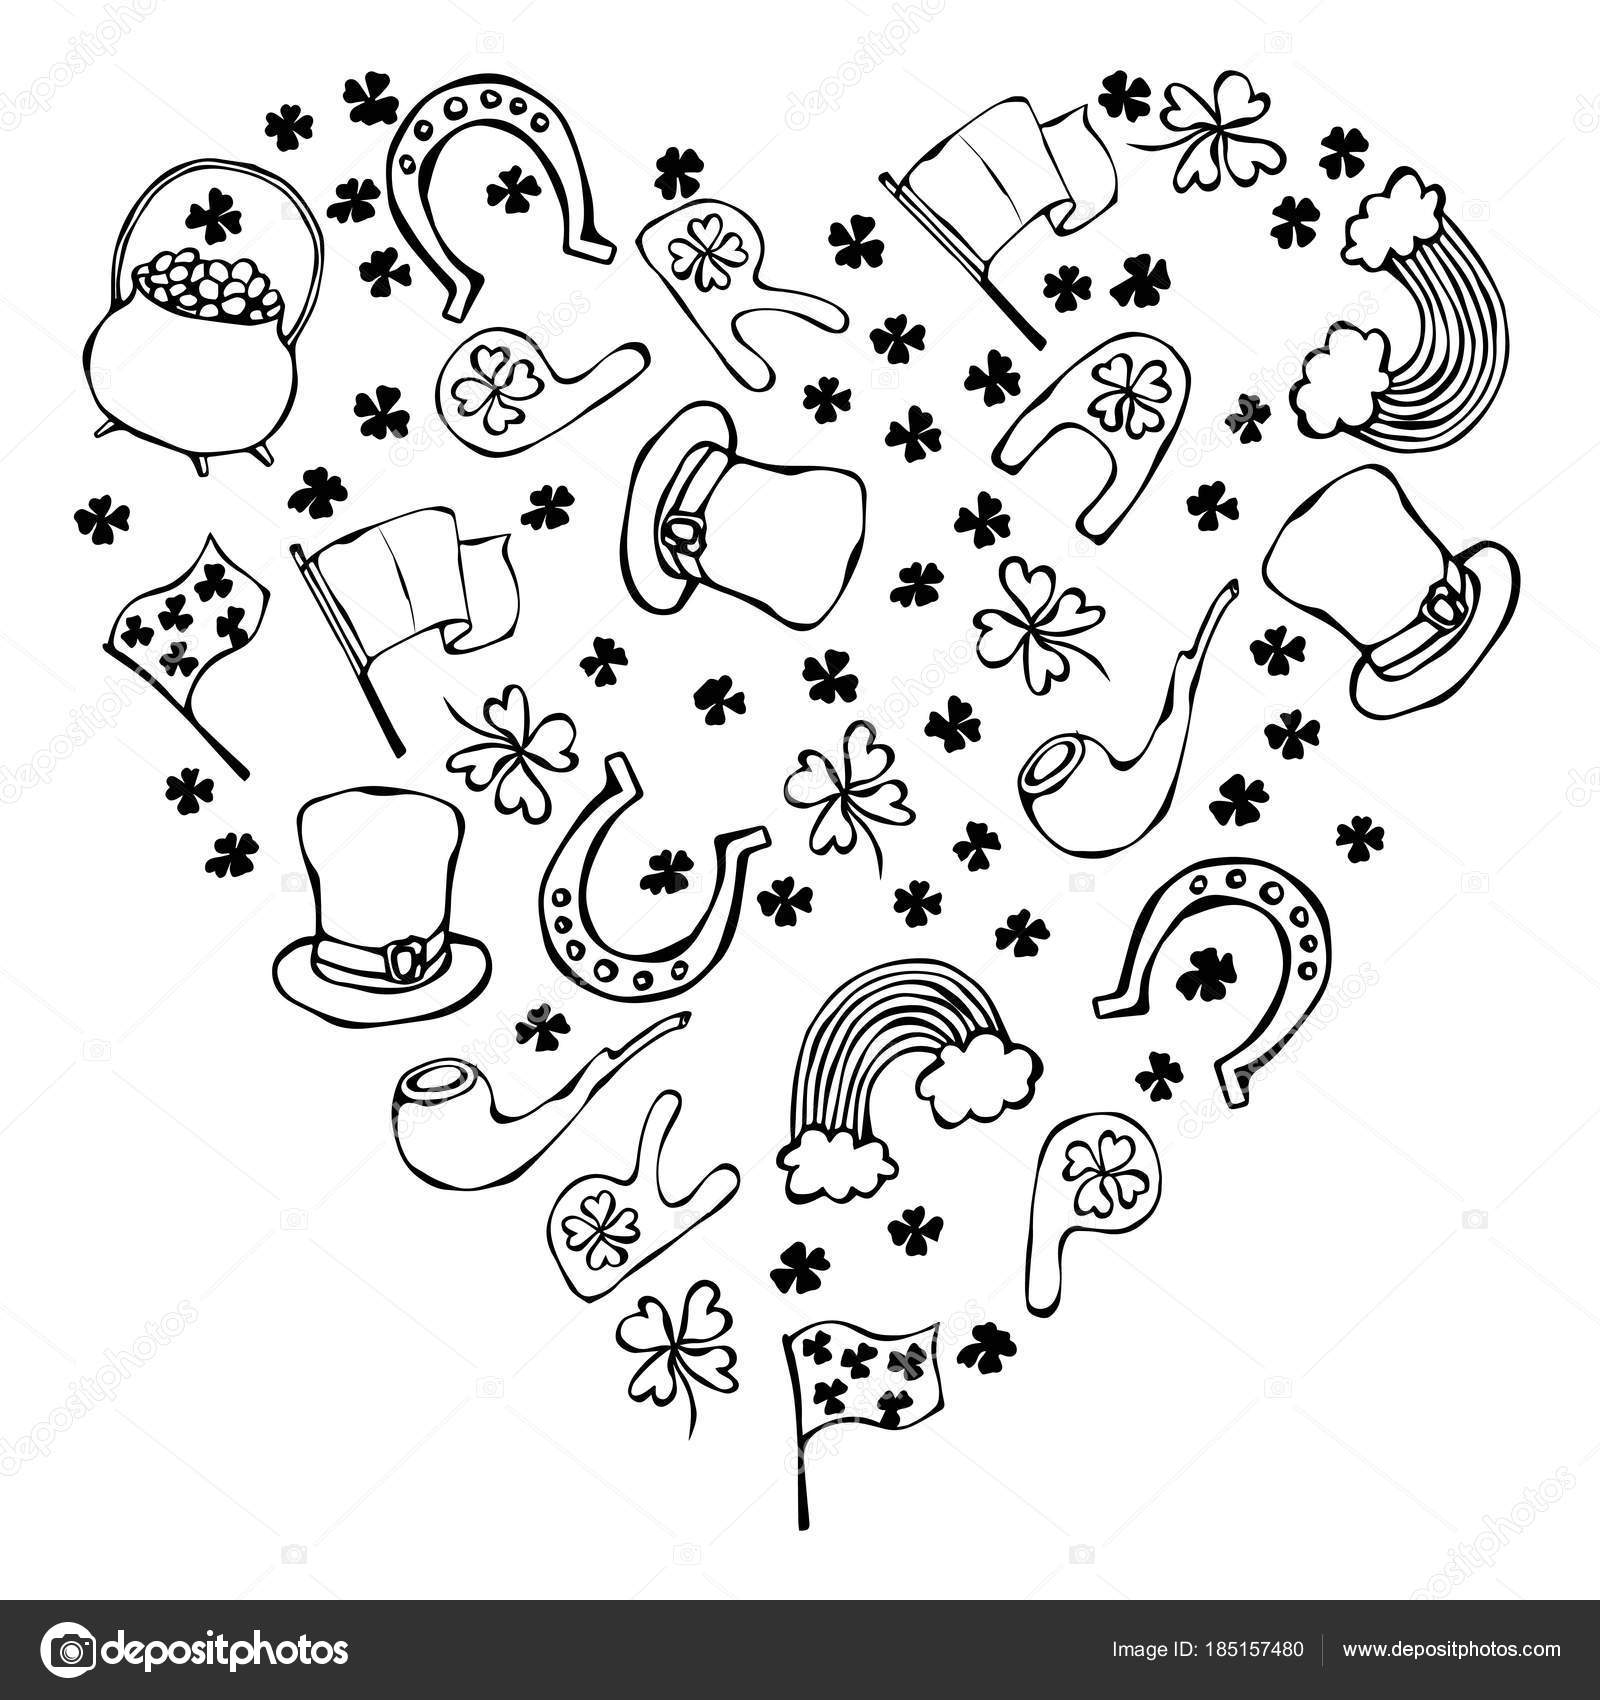 Collection Of Irish Symbols Heart Shape Background Leprechauns Hat Horseshoe Pot Of Gold Flag Beer Mug Rainbow Clover St Patrick Day Savoyar Doodle Style Stock Photo C Leen Savoyar Com 185157480